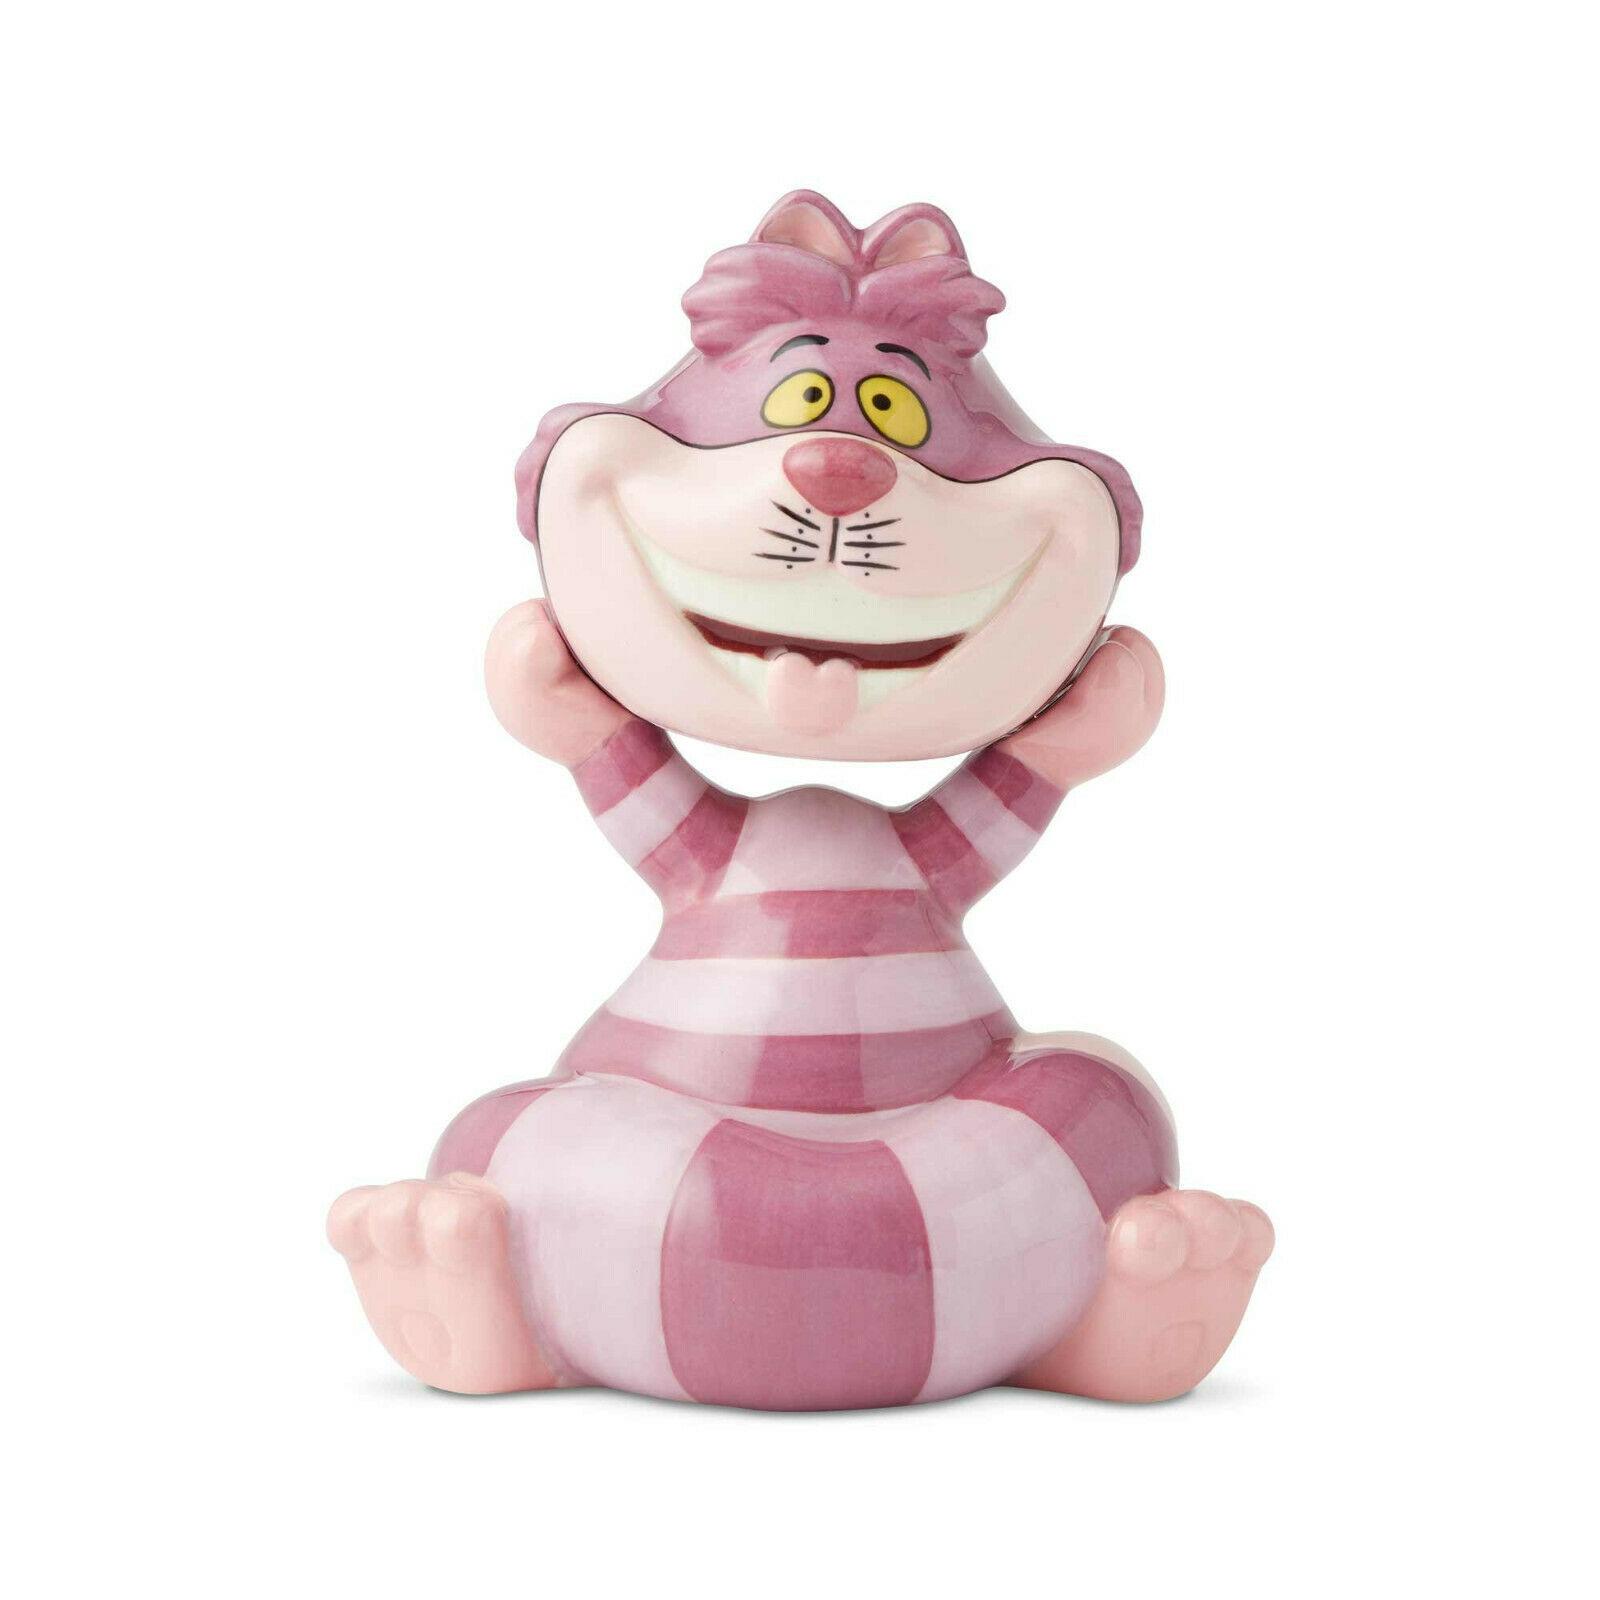 Disney Cheshire Cat Salt Pepper Shakers Set Ceramic Cartoon Collectible Retired